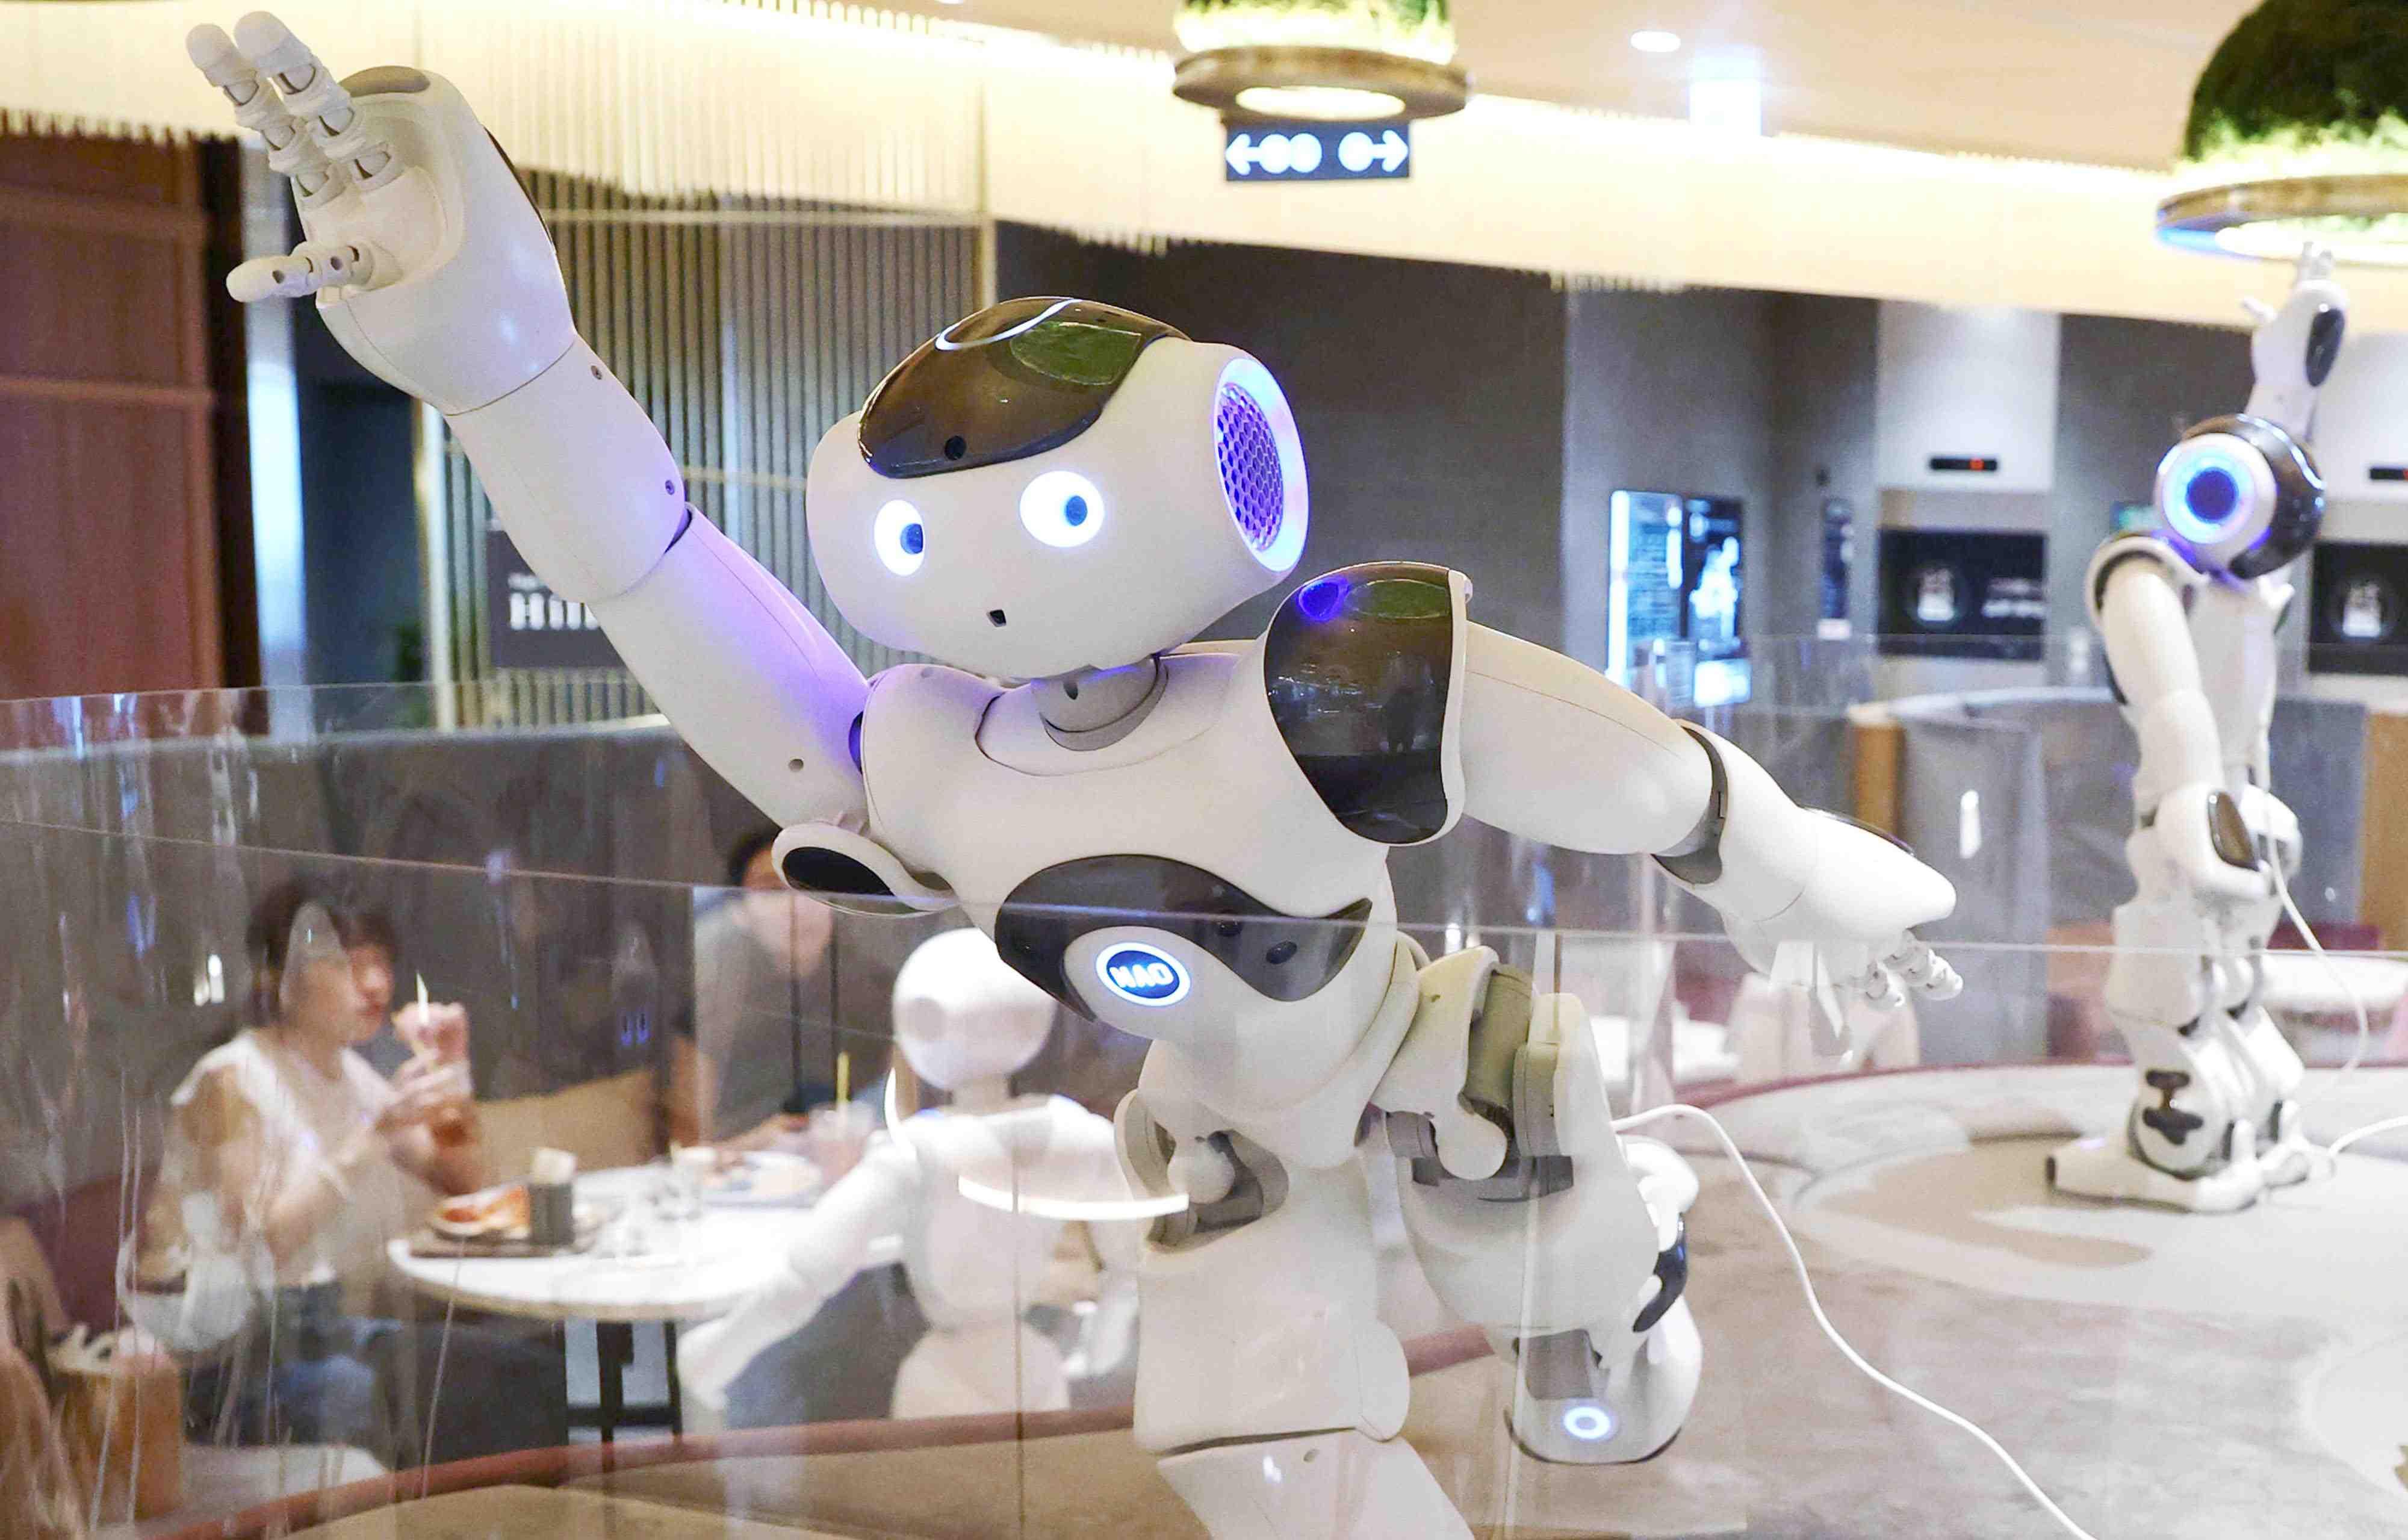 Robot in Japan 017